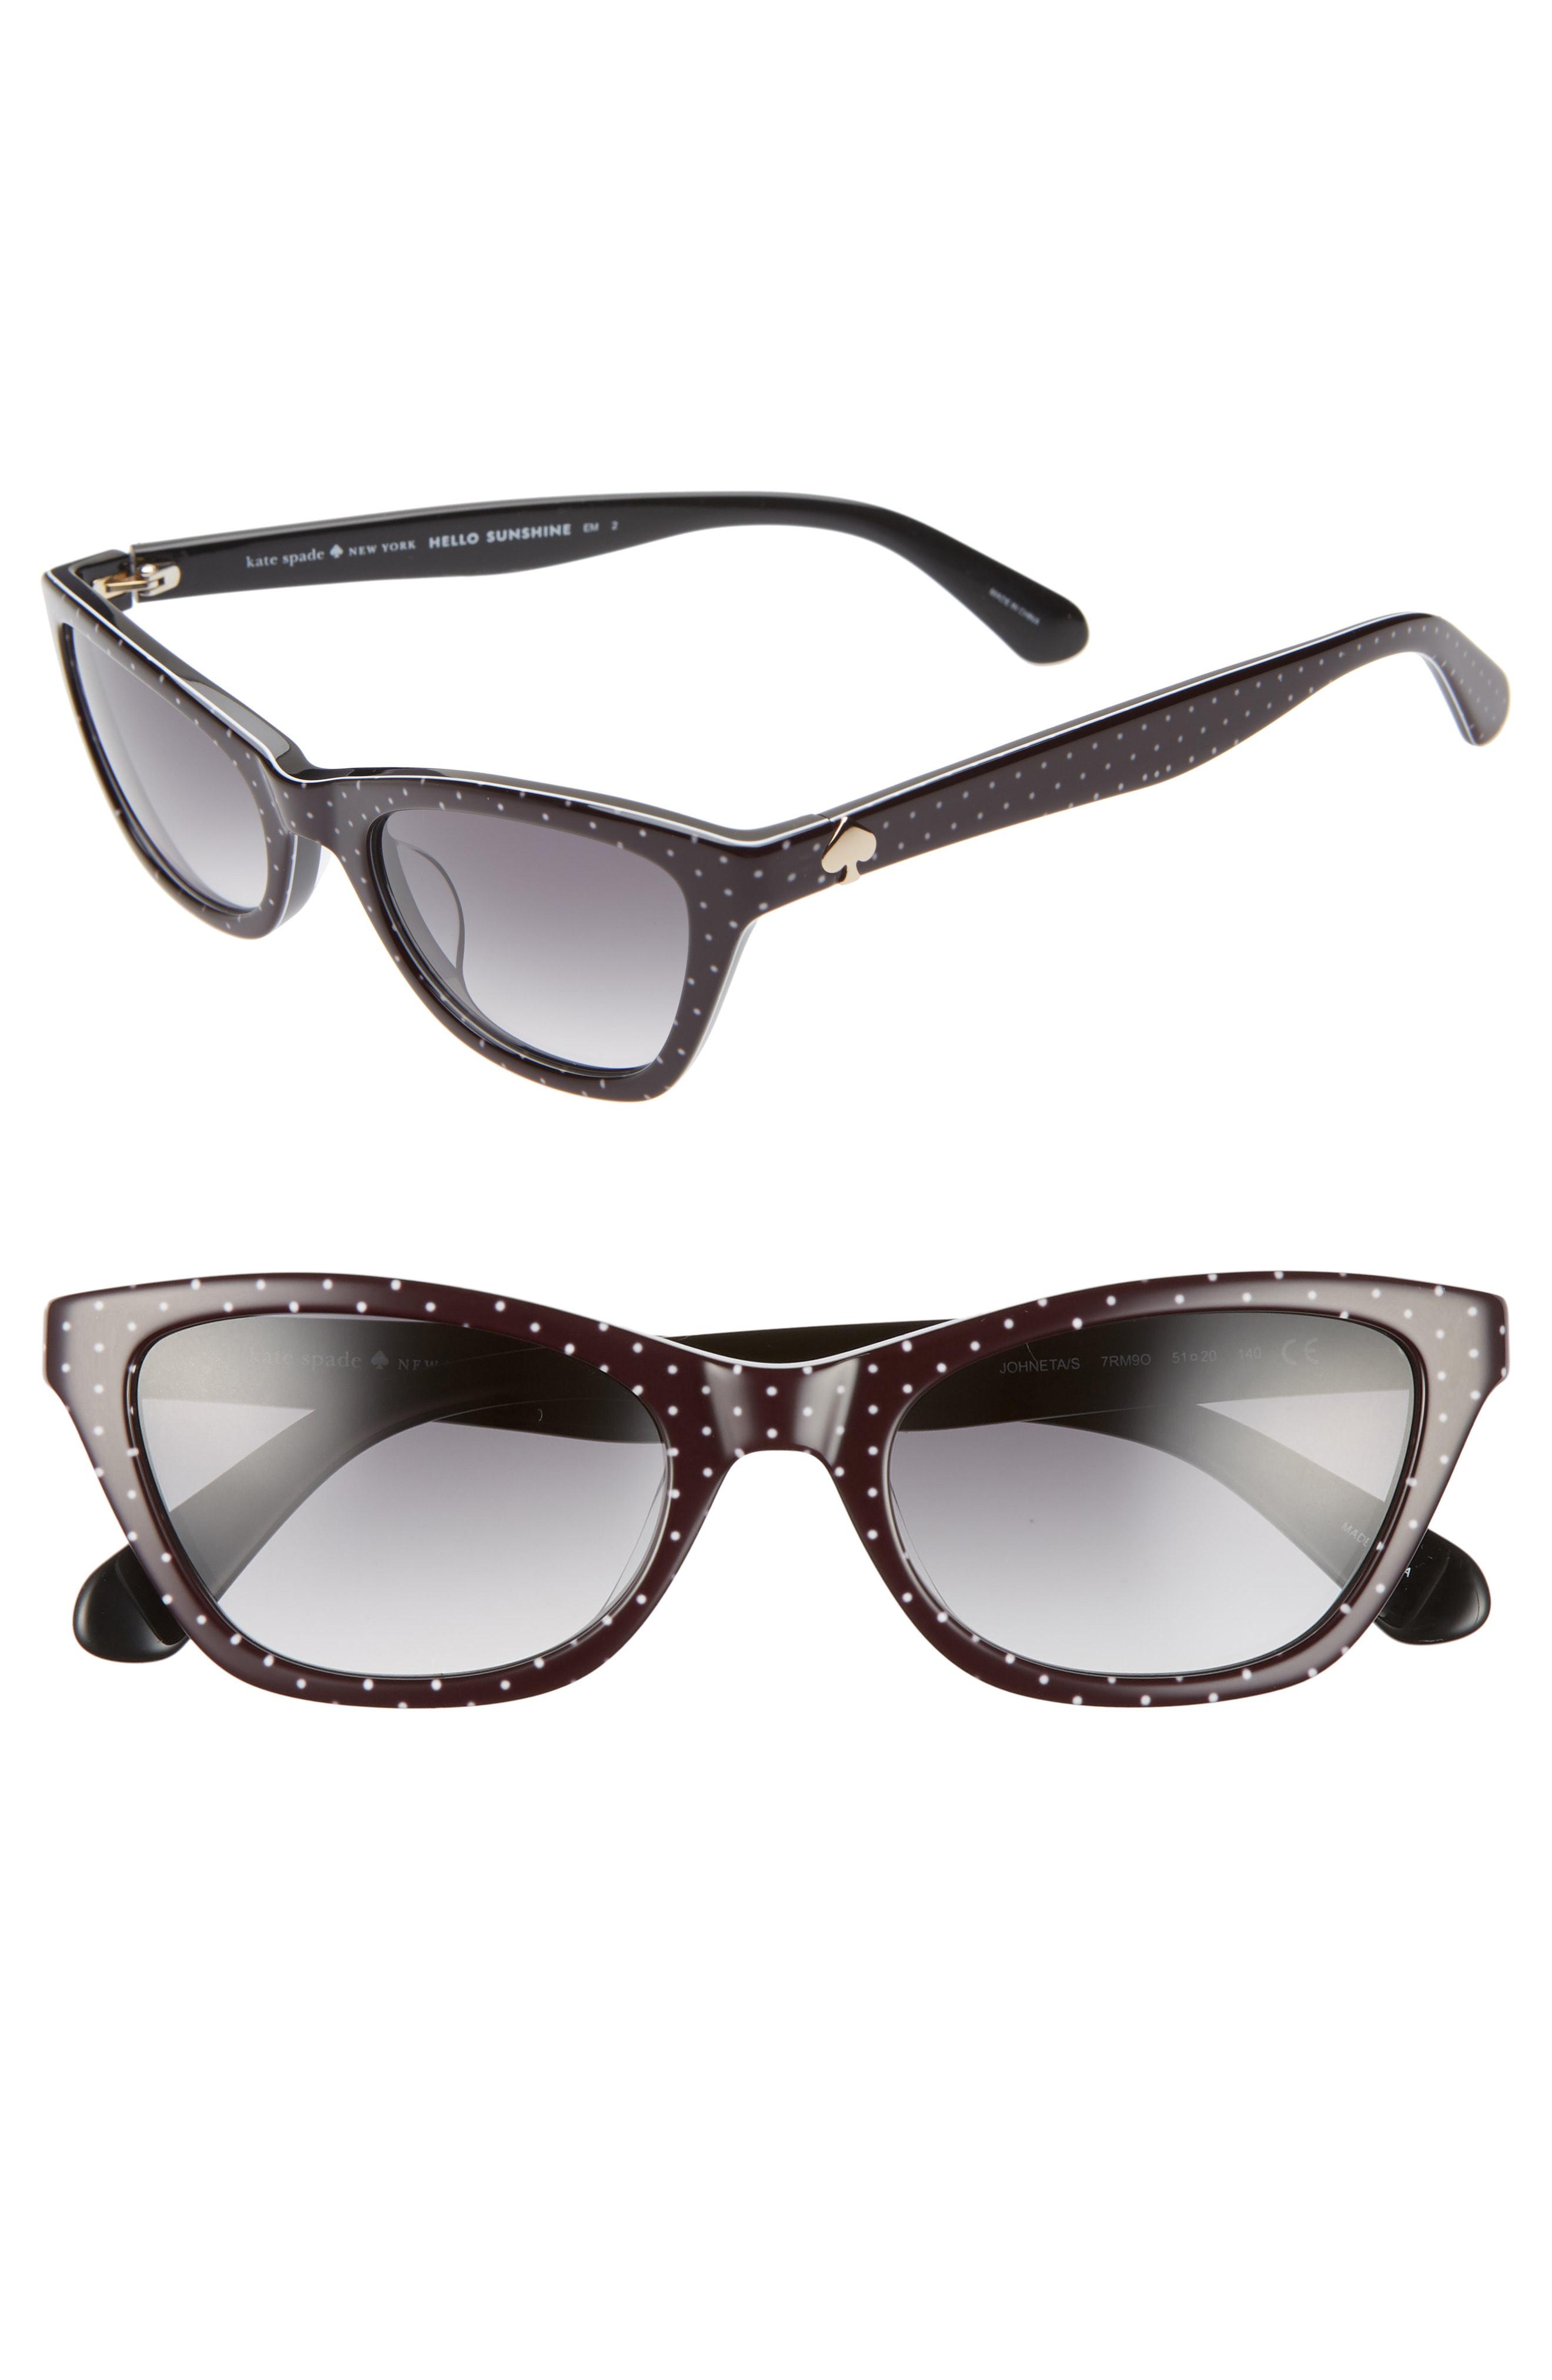 81861539028 Kate Spade Johneta 51Mm Cat Eye Sunglasses - Black  Gold